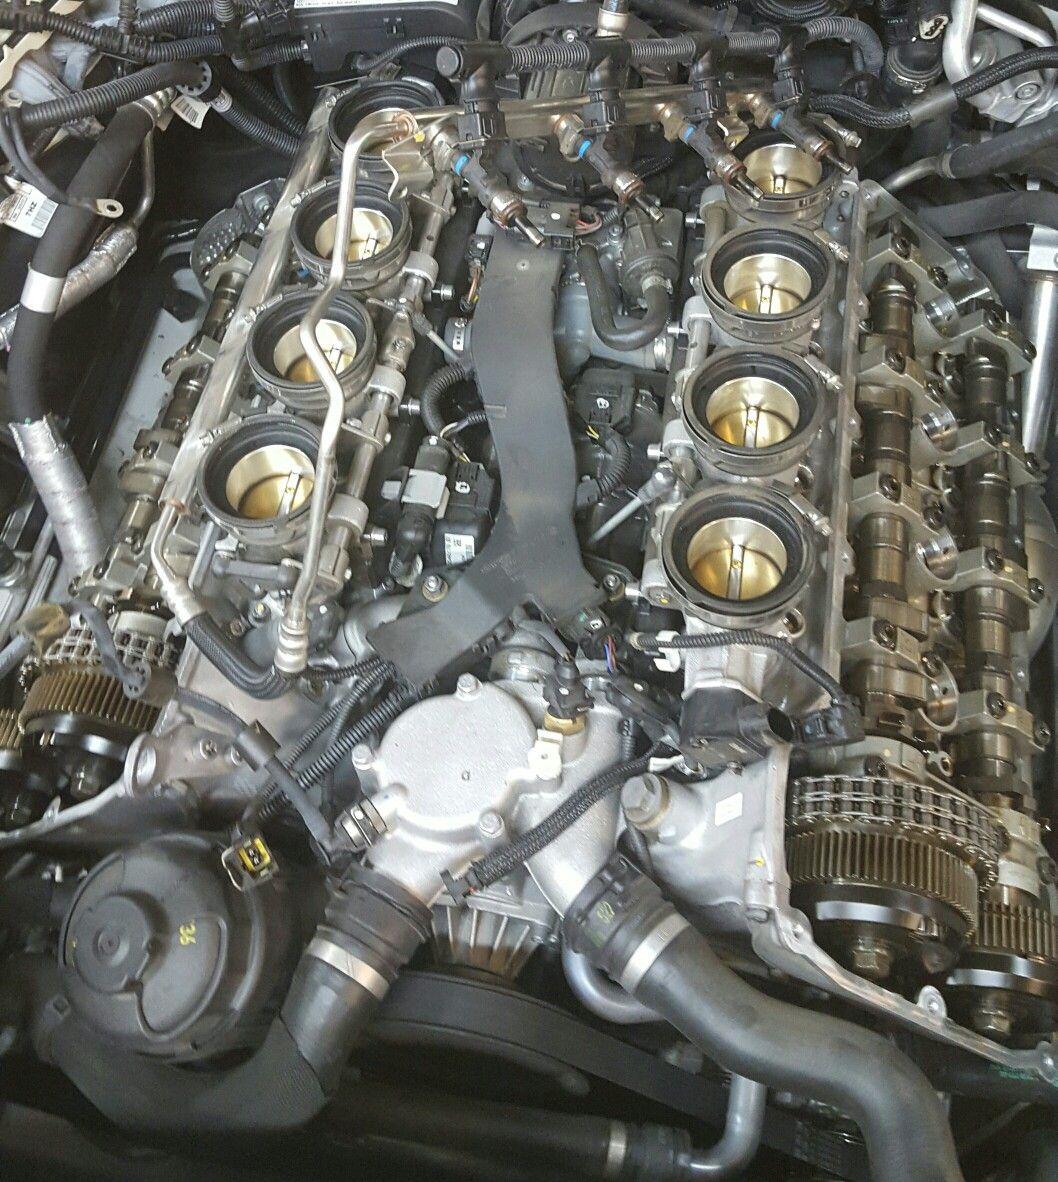 E92 M3 v8 old school BMW | ENGINES | Pinterest | Engine, Car engine ...